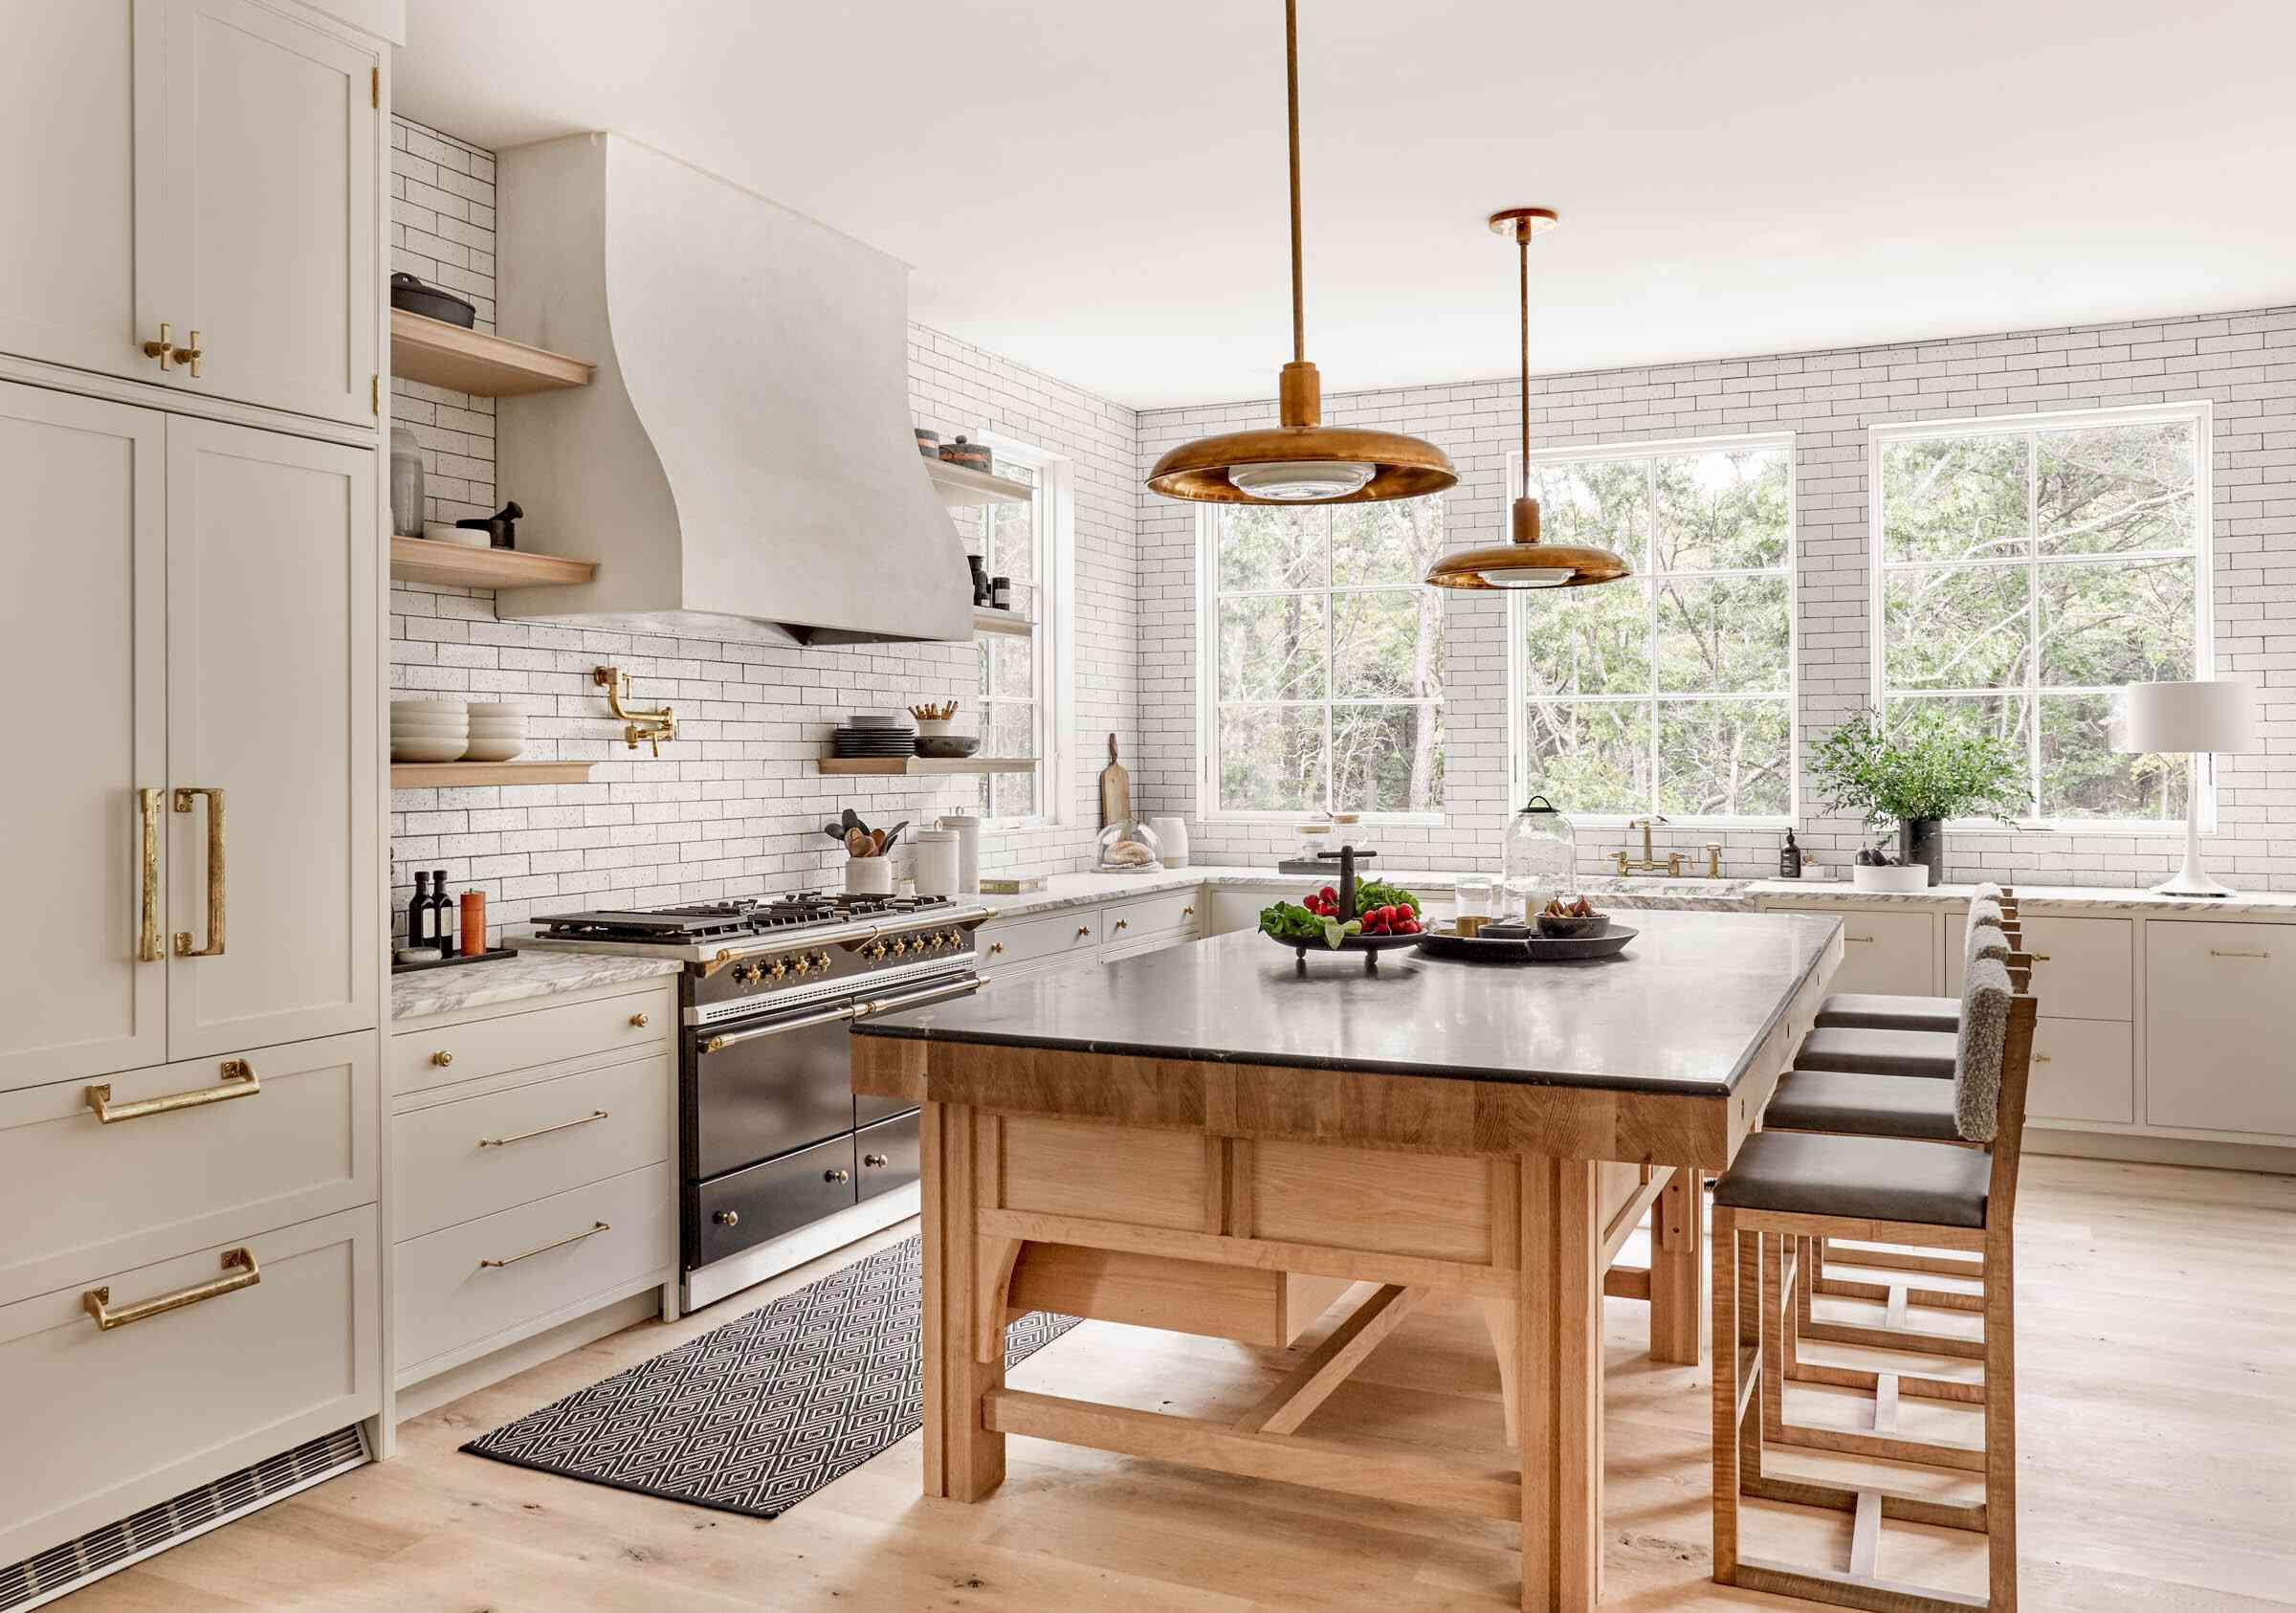 White kitchen with brick tile walls